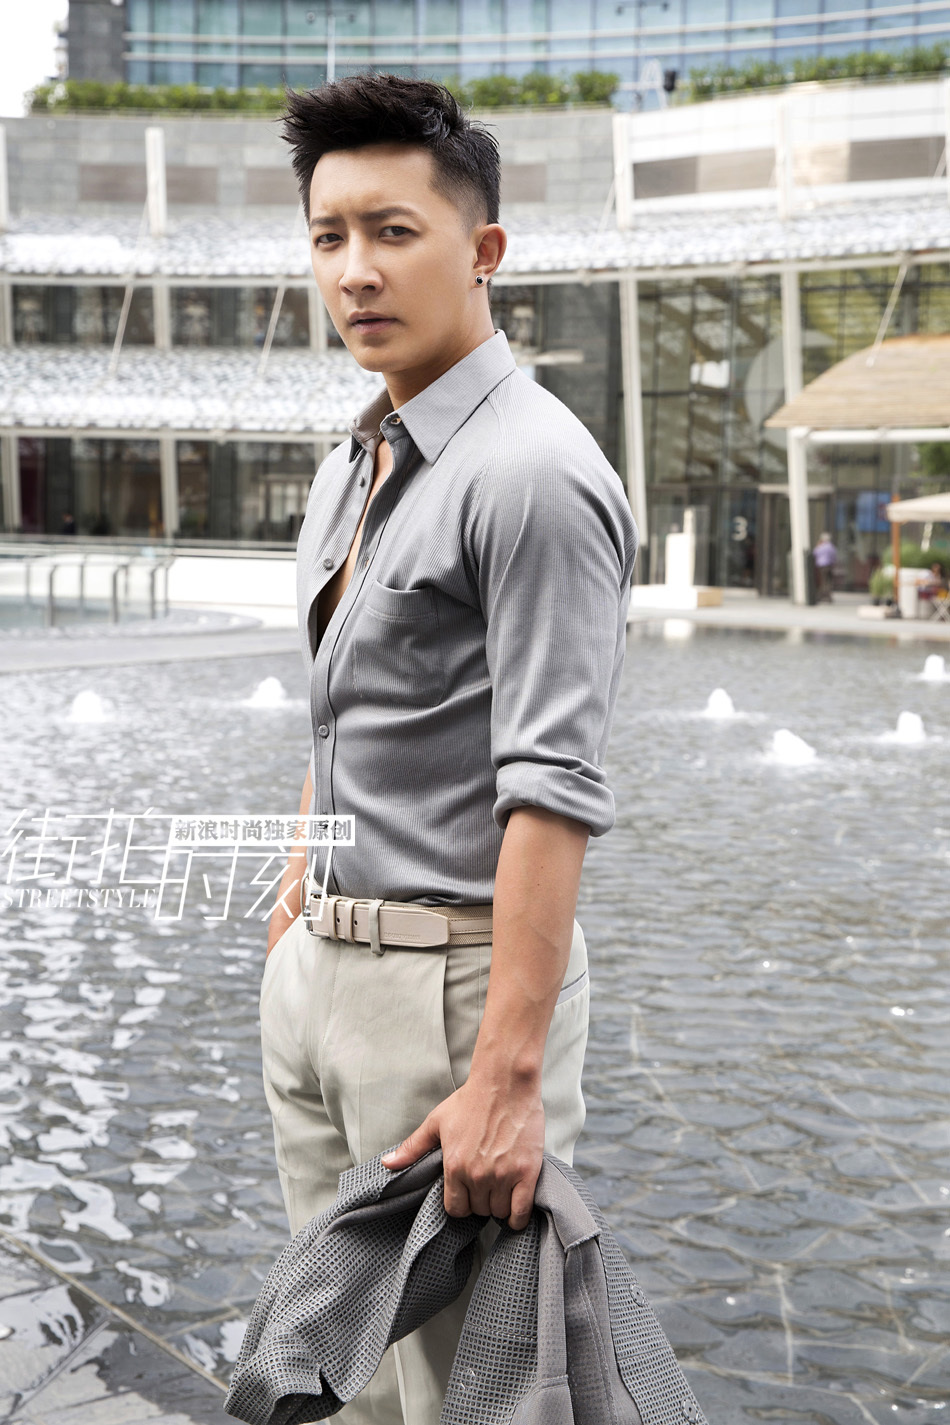 Geng Xin by Hankyung(Han Geng) full album download | Free ...